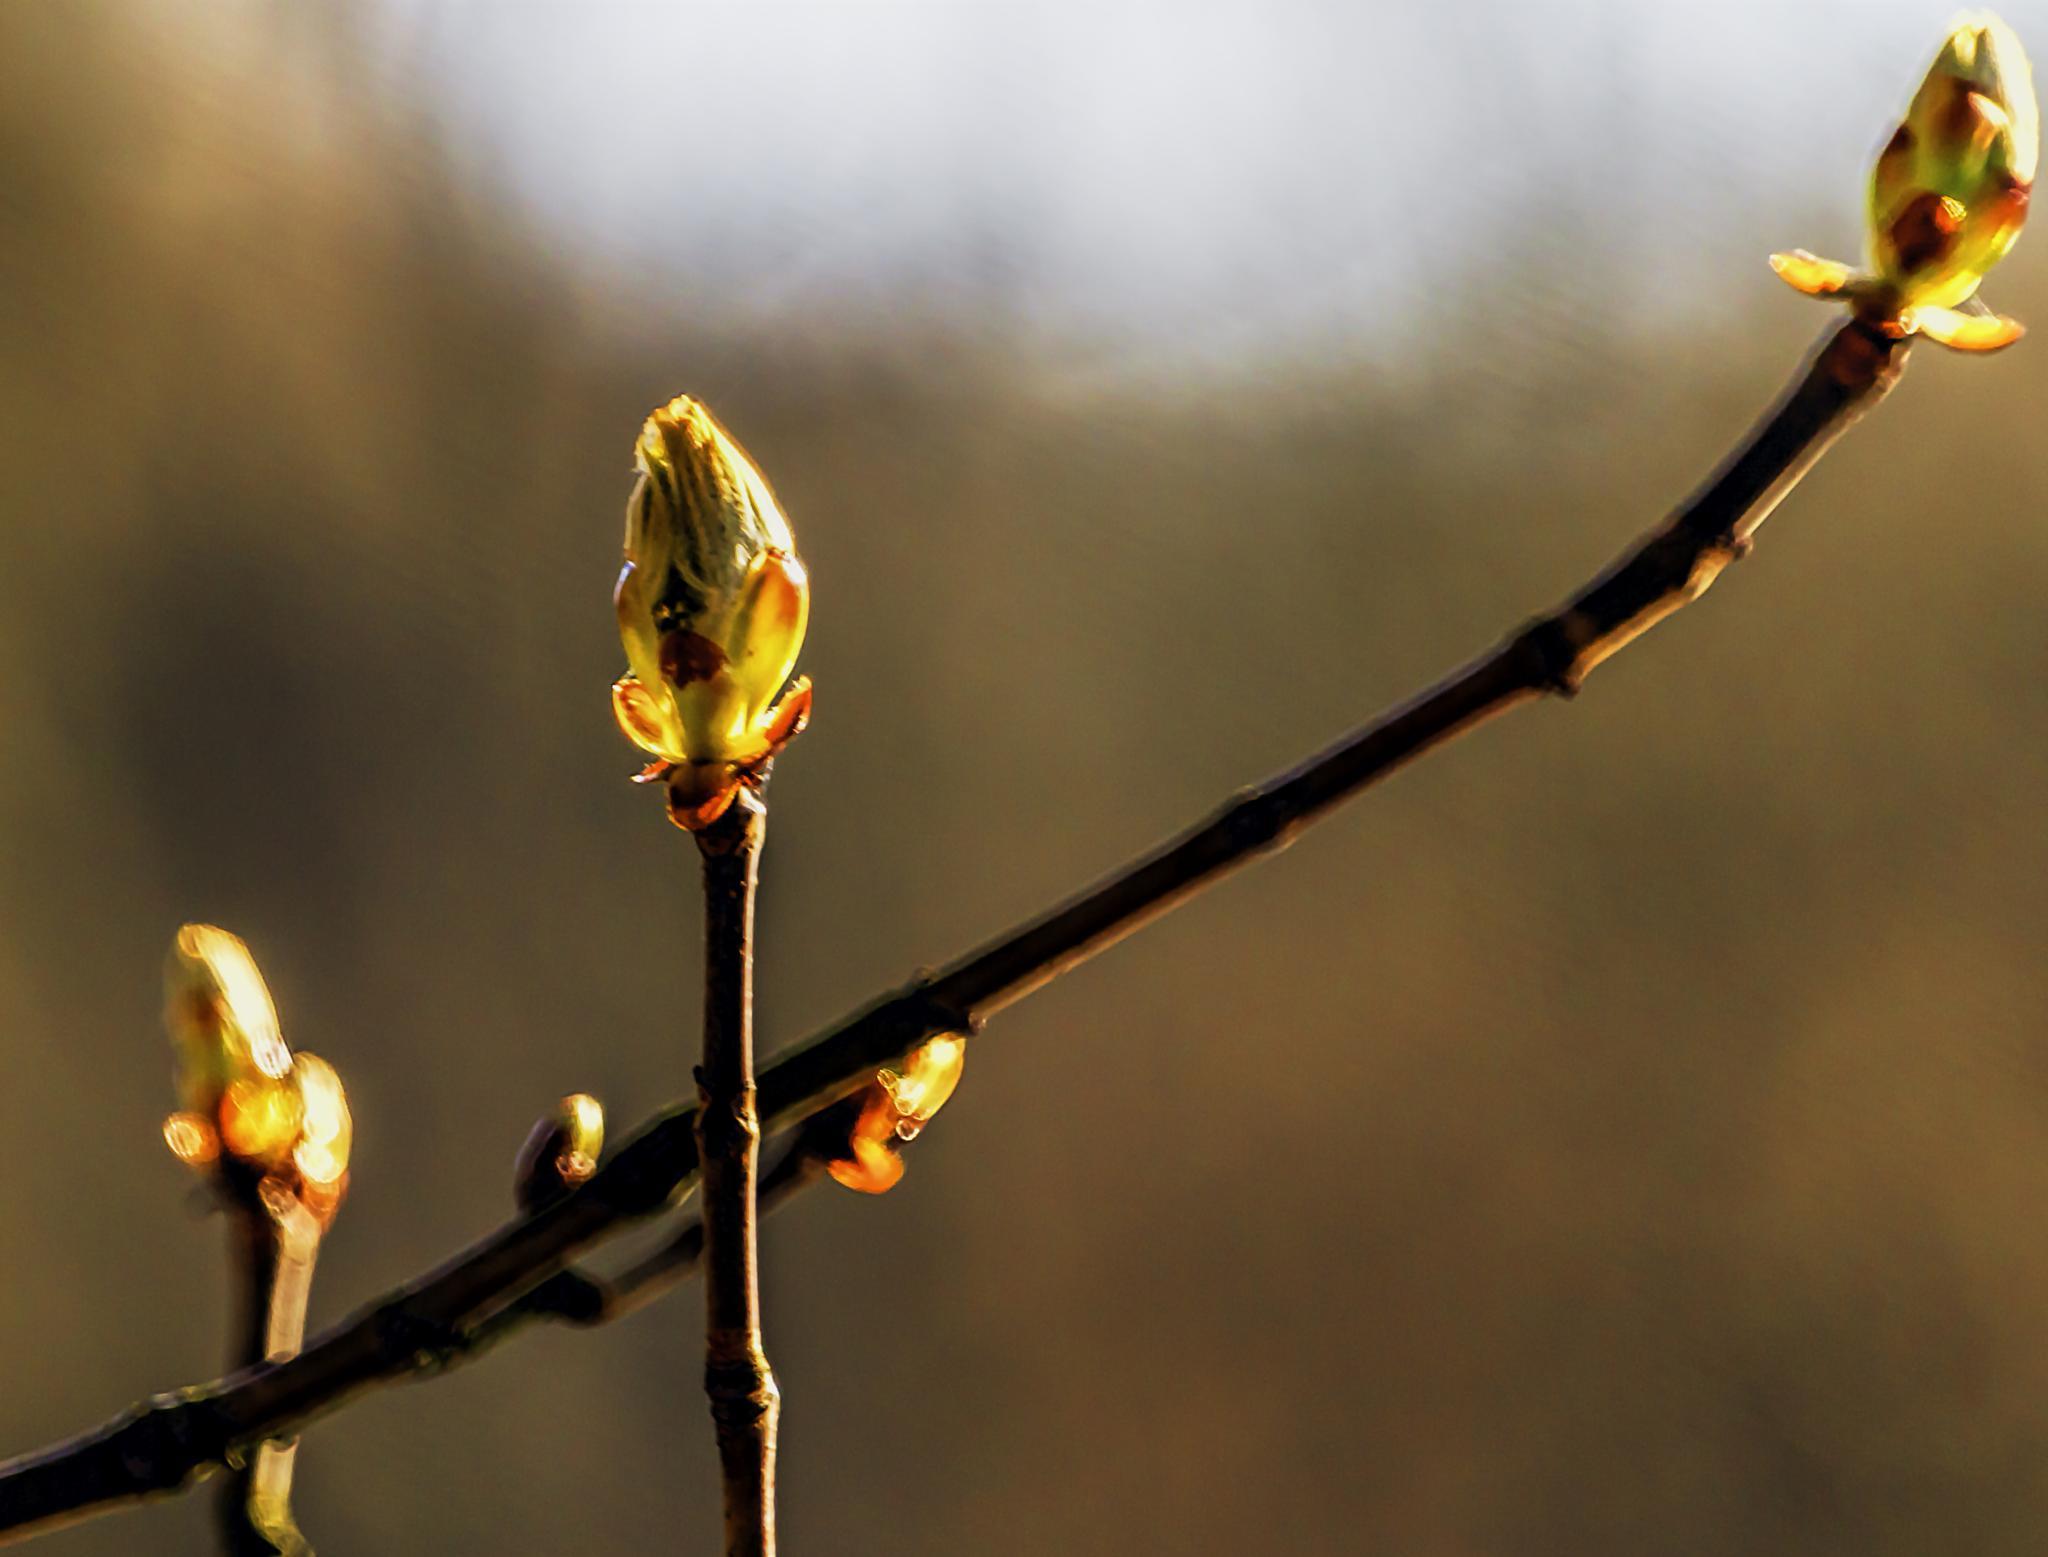 Just before spring arrives by M. Loeth